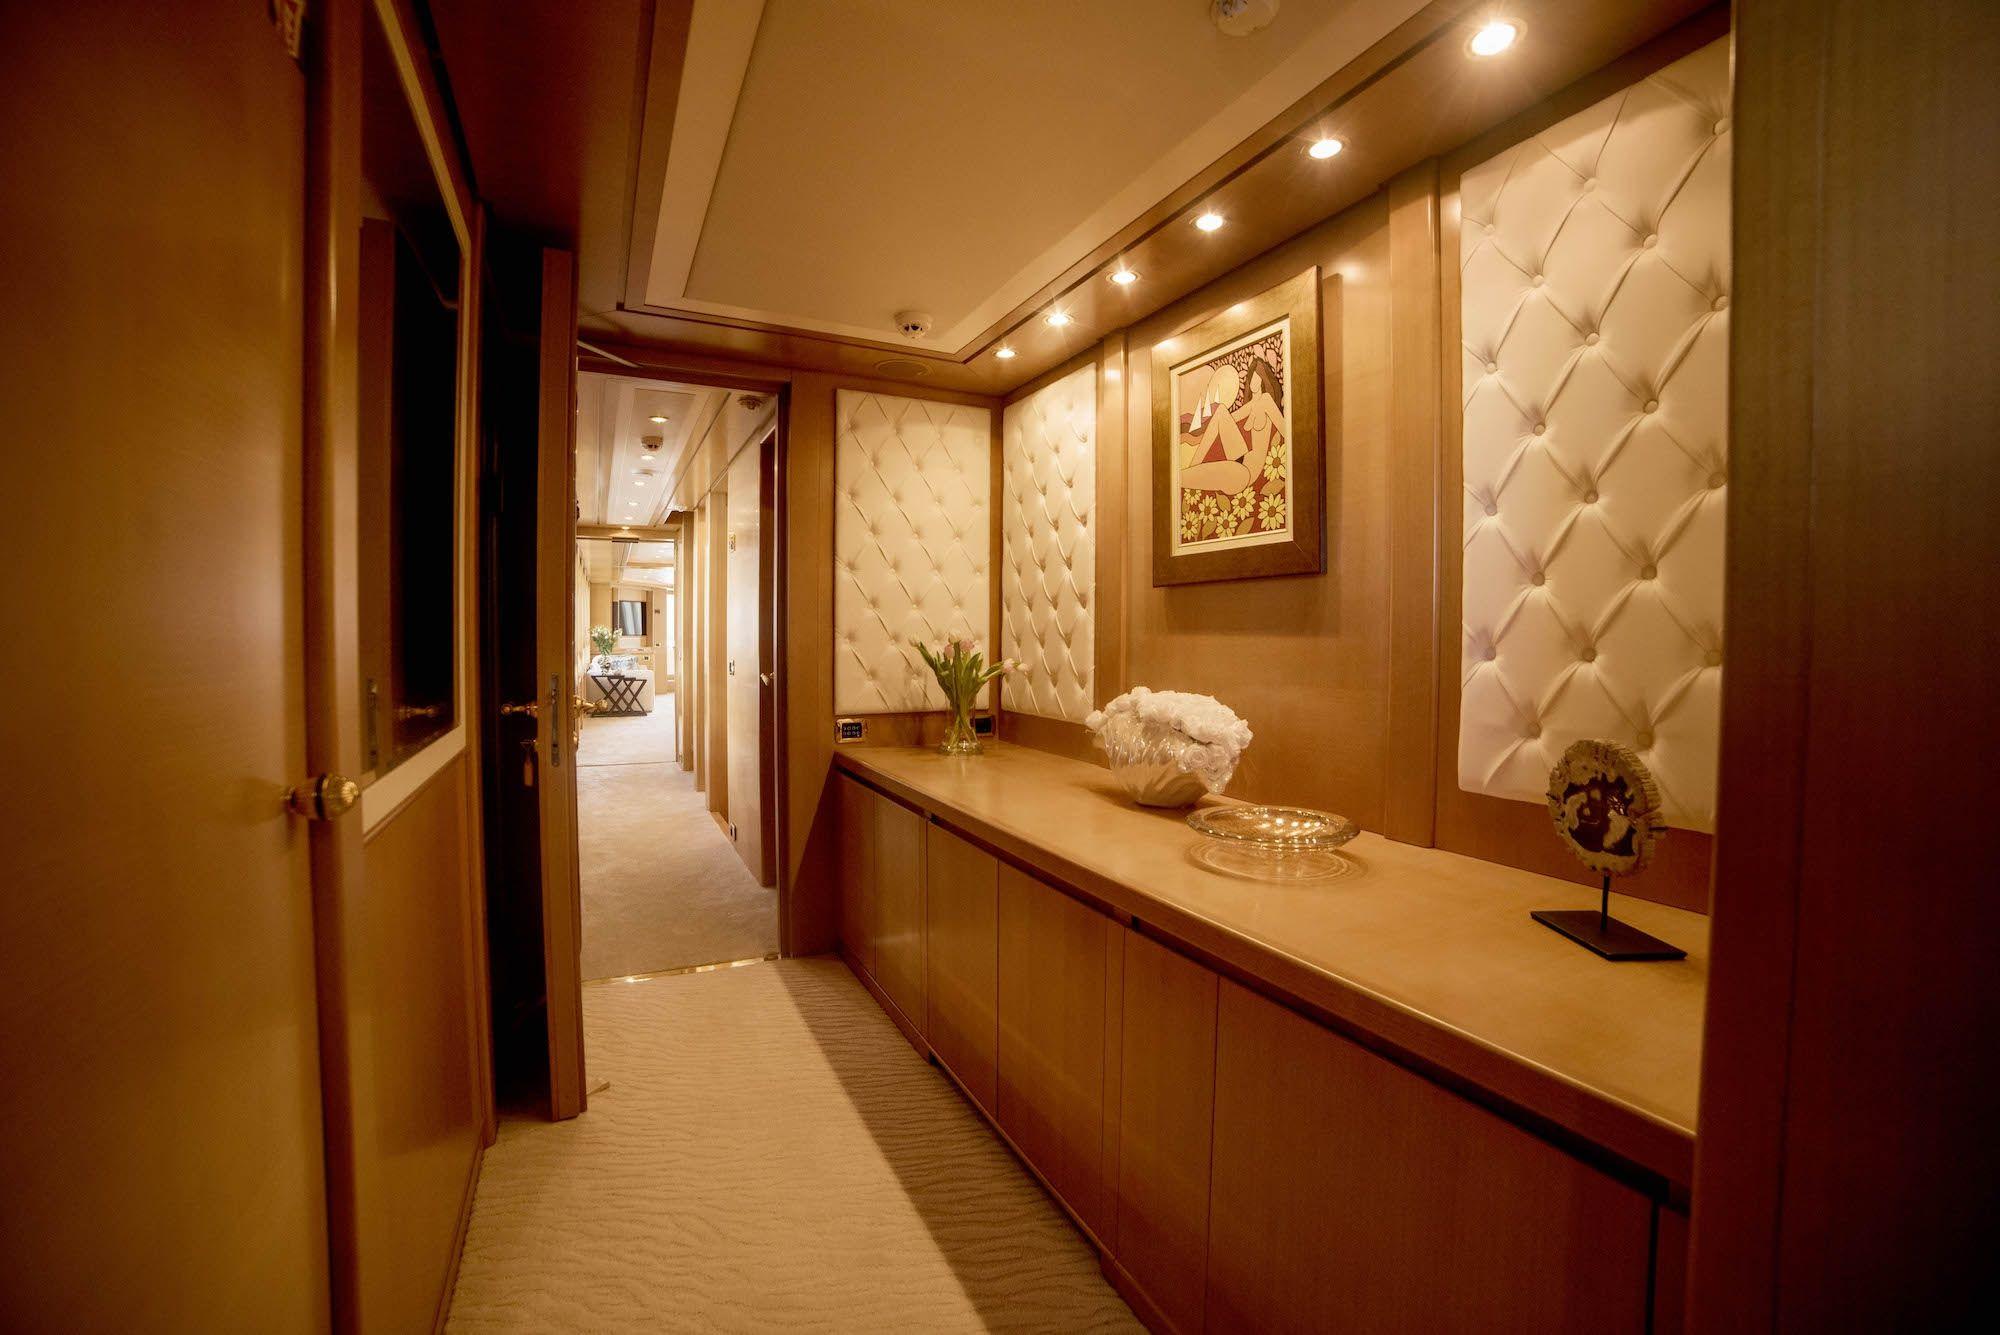 ISA Motor Yacht OASIS Owners Suite